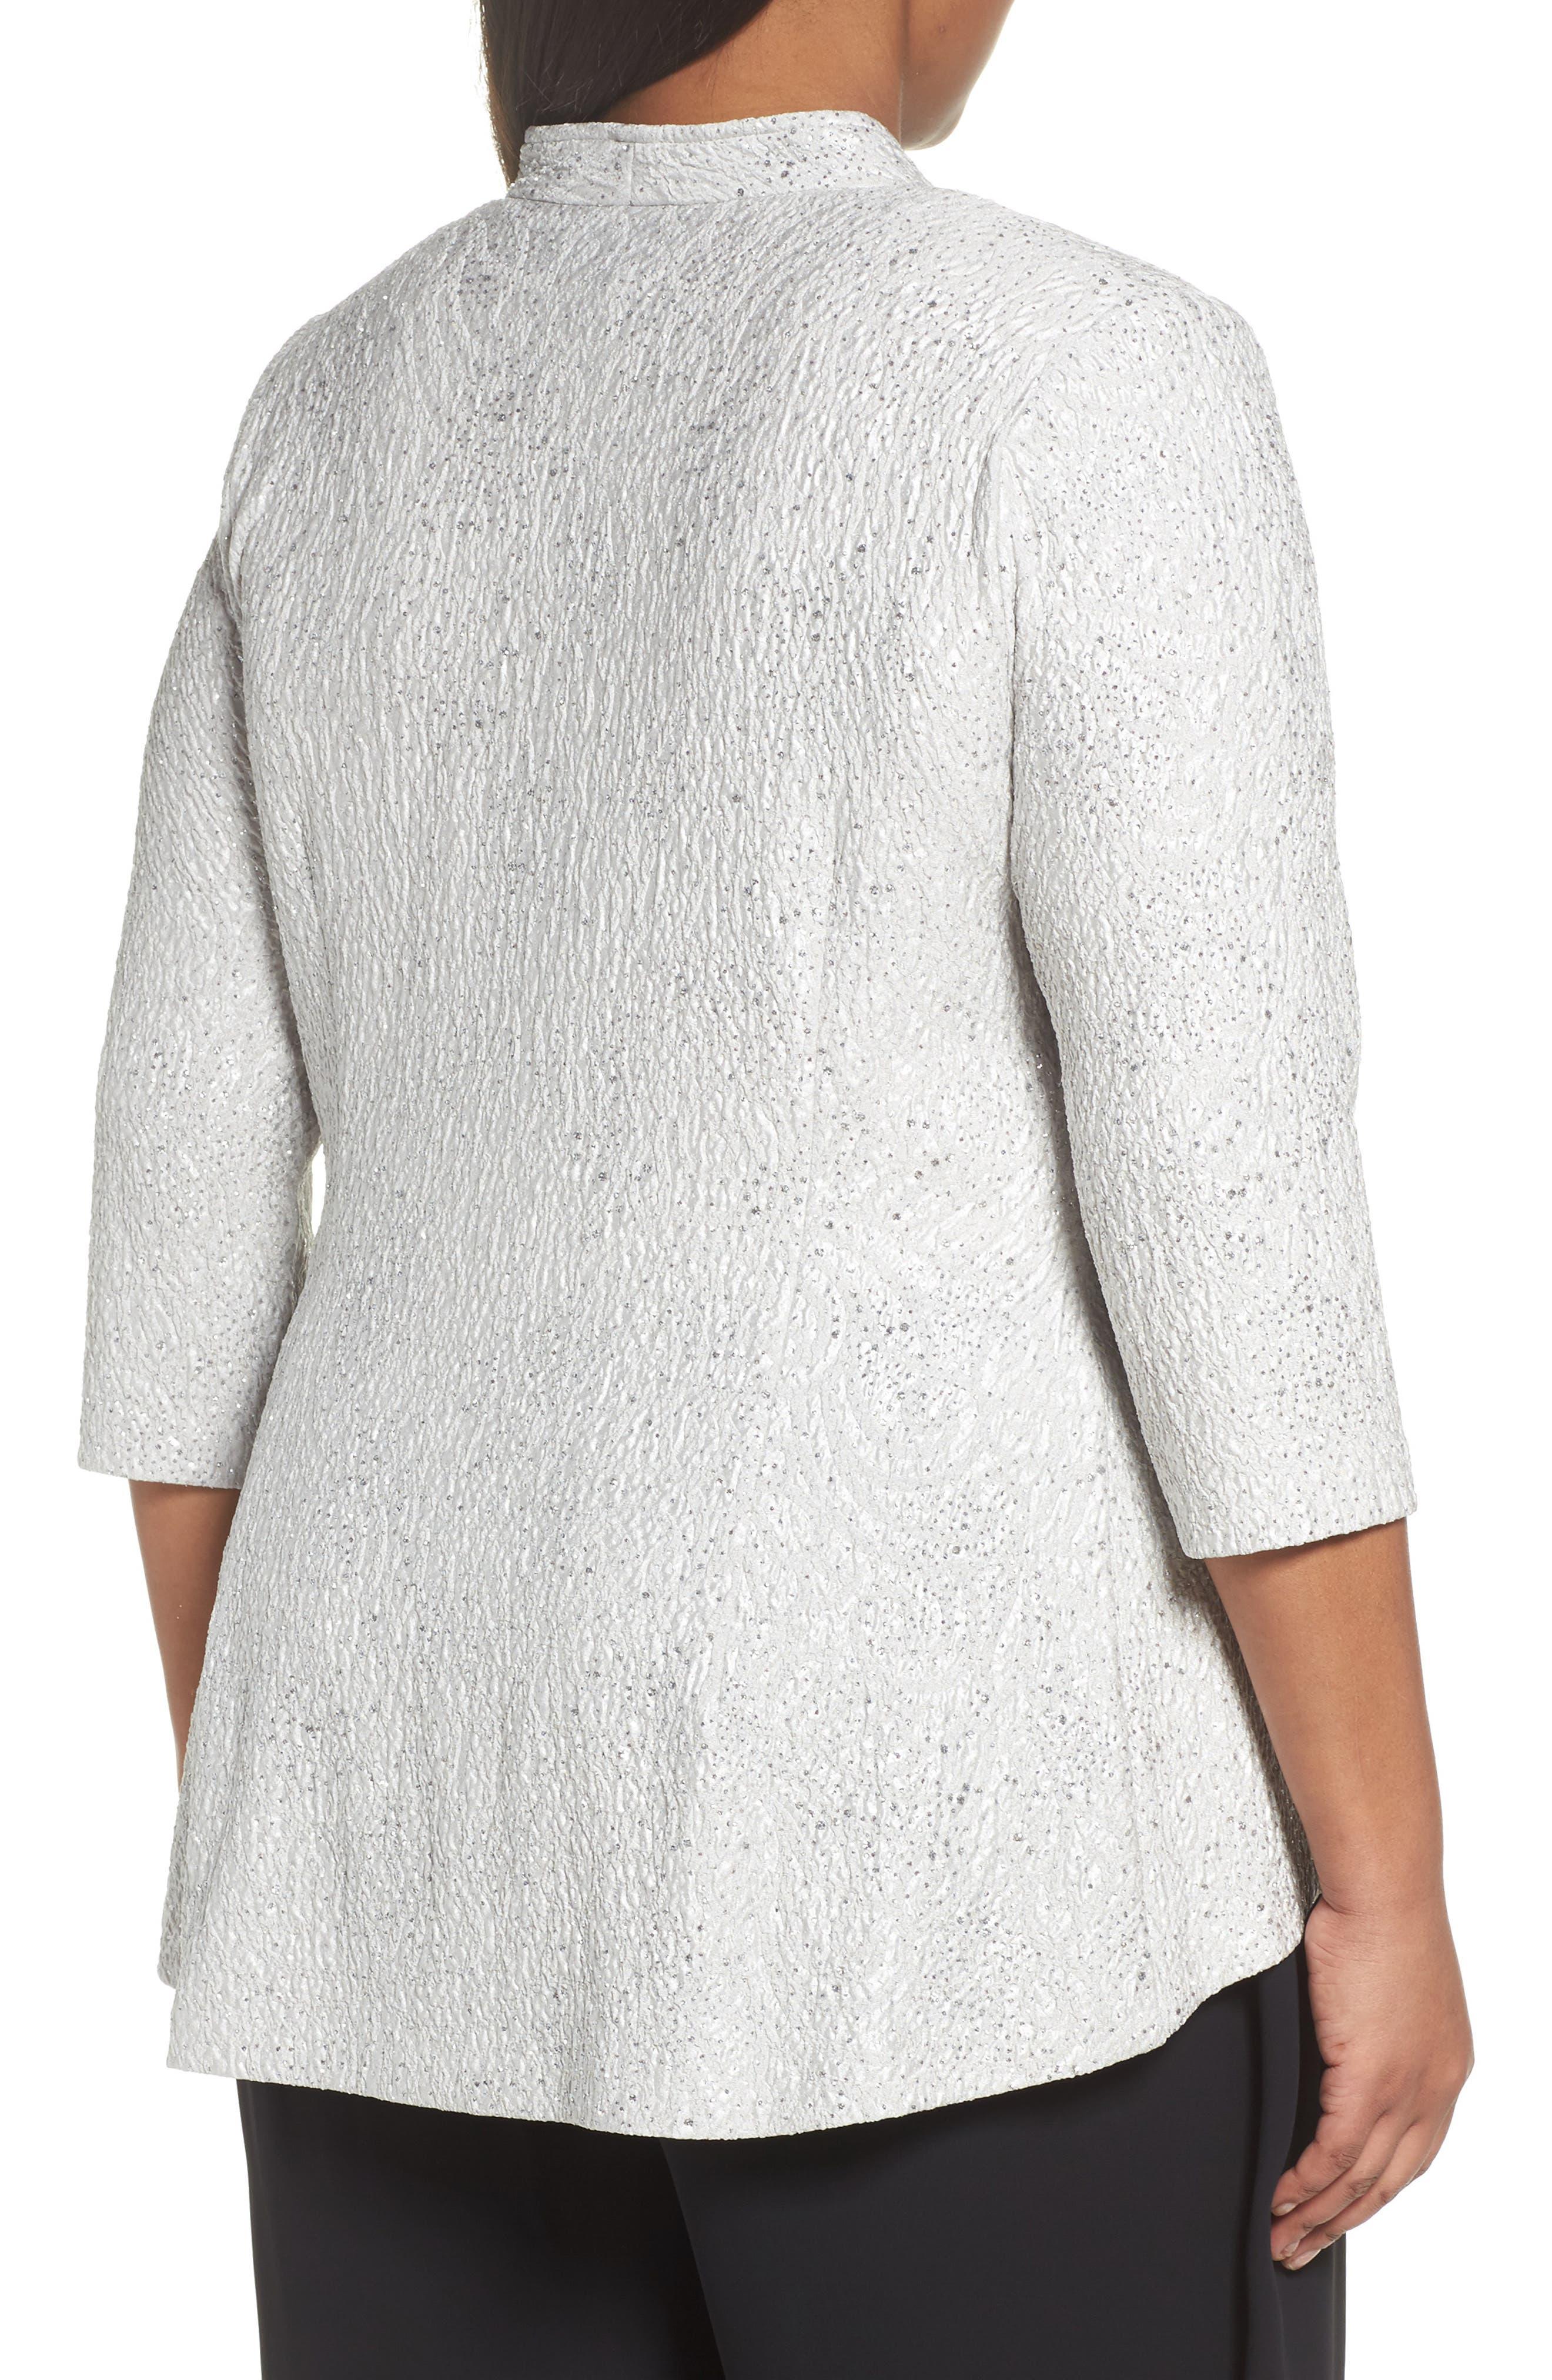 Alternate Image 2  - Alex Evenings Mandarin Collar Shimmer Jacket (Plus Size)